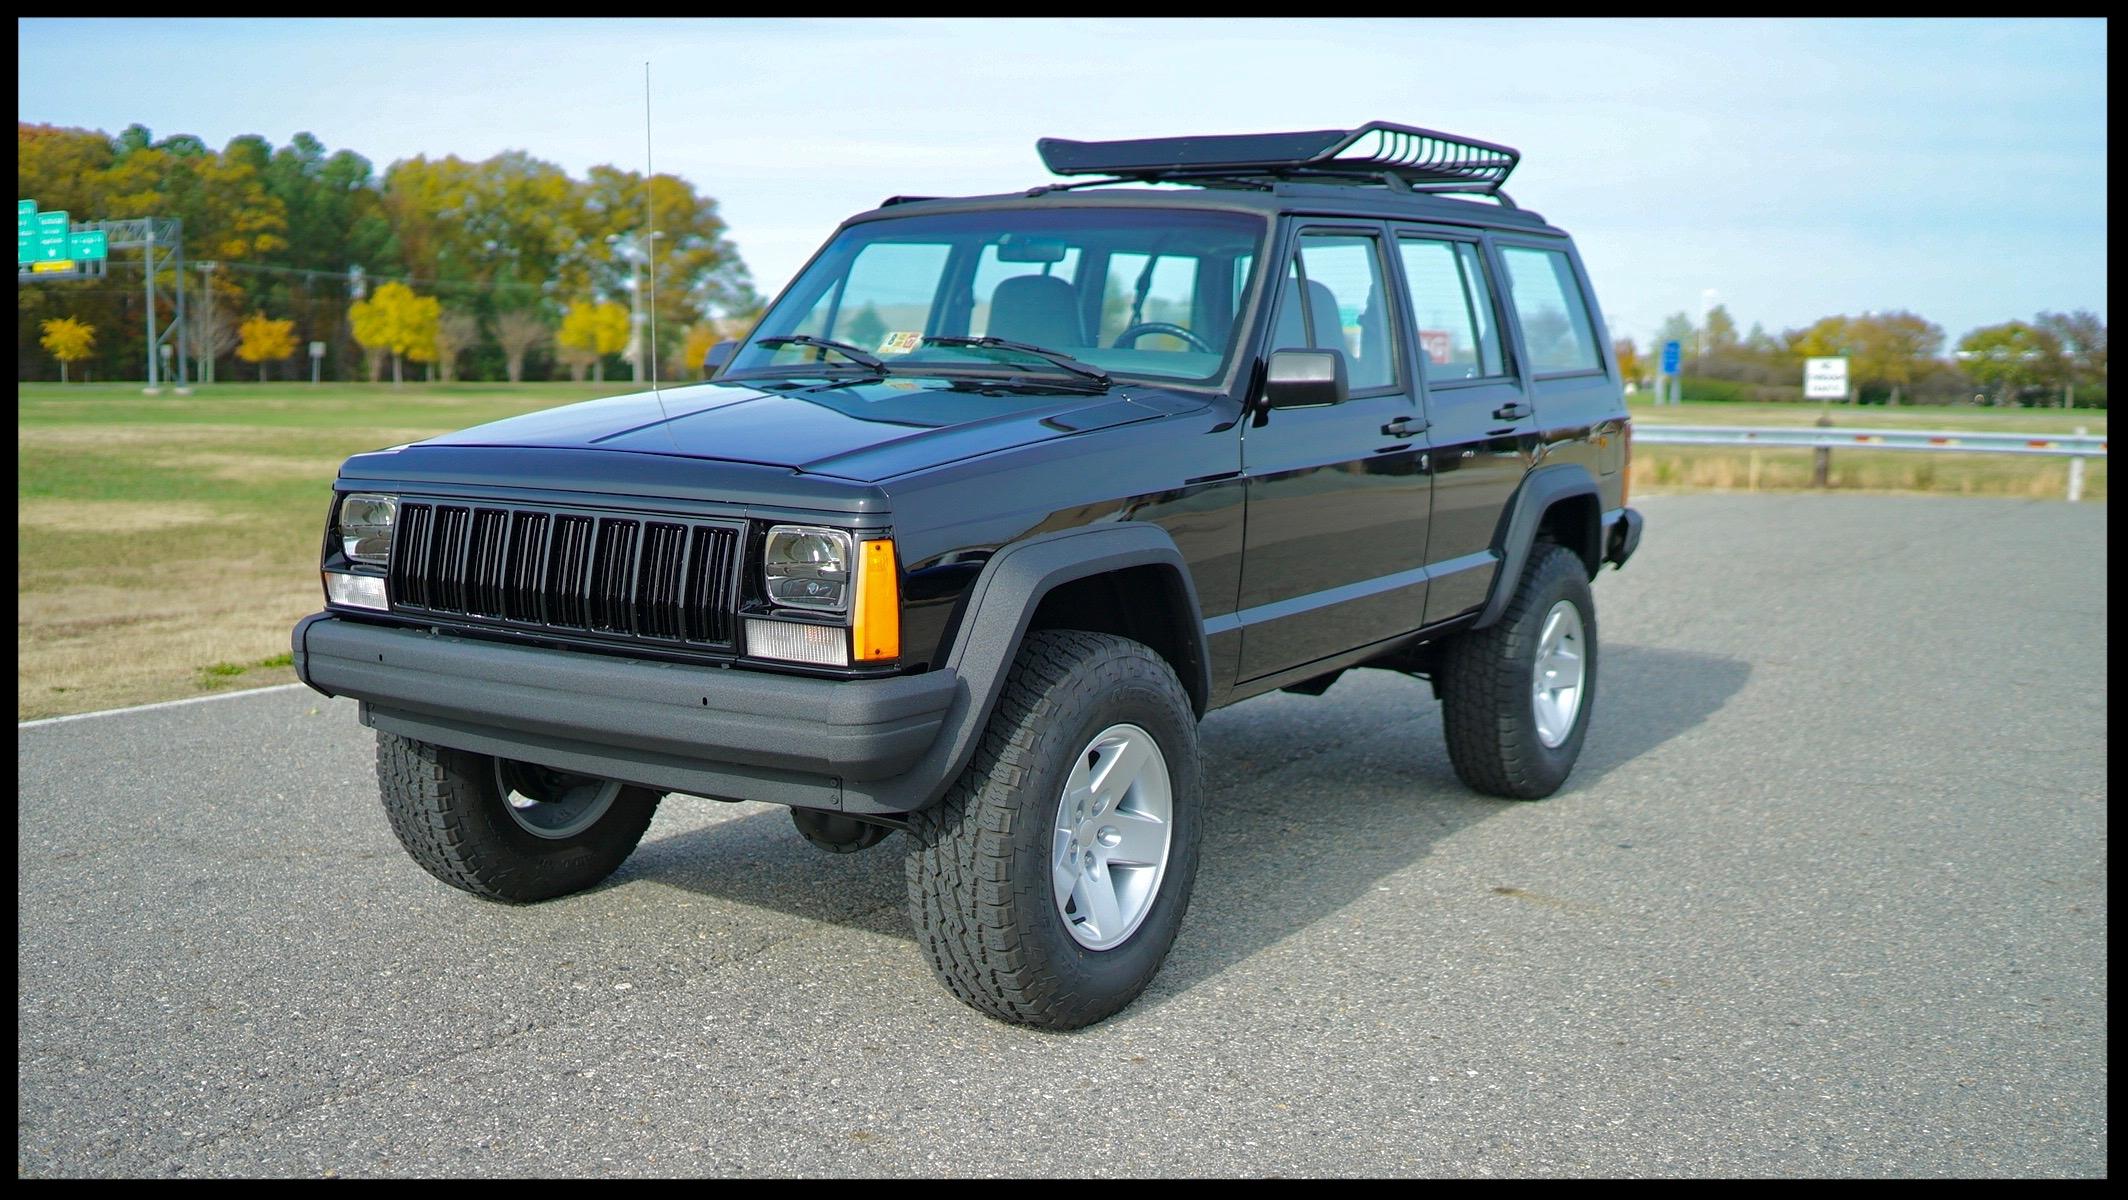 1996 lifted Cherokee XJ Sport